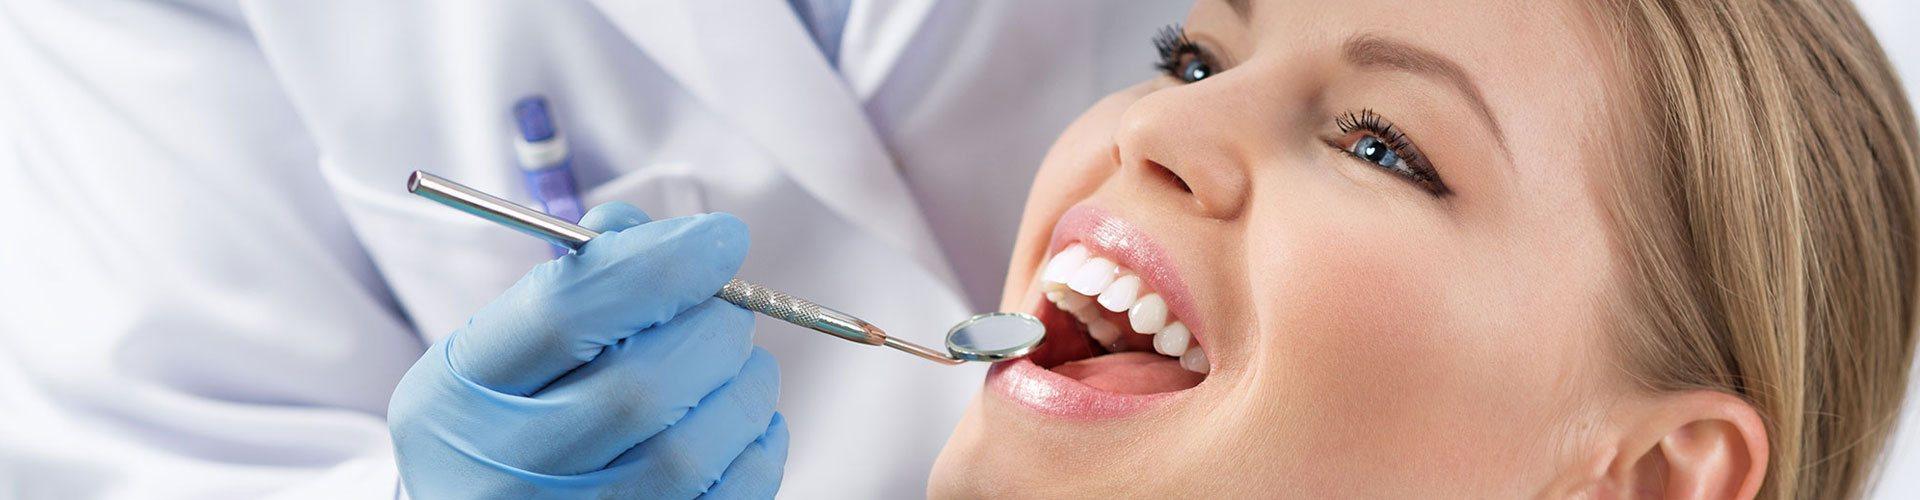 Dentist In Powder Springs Ga Stress Free Dentistry